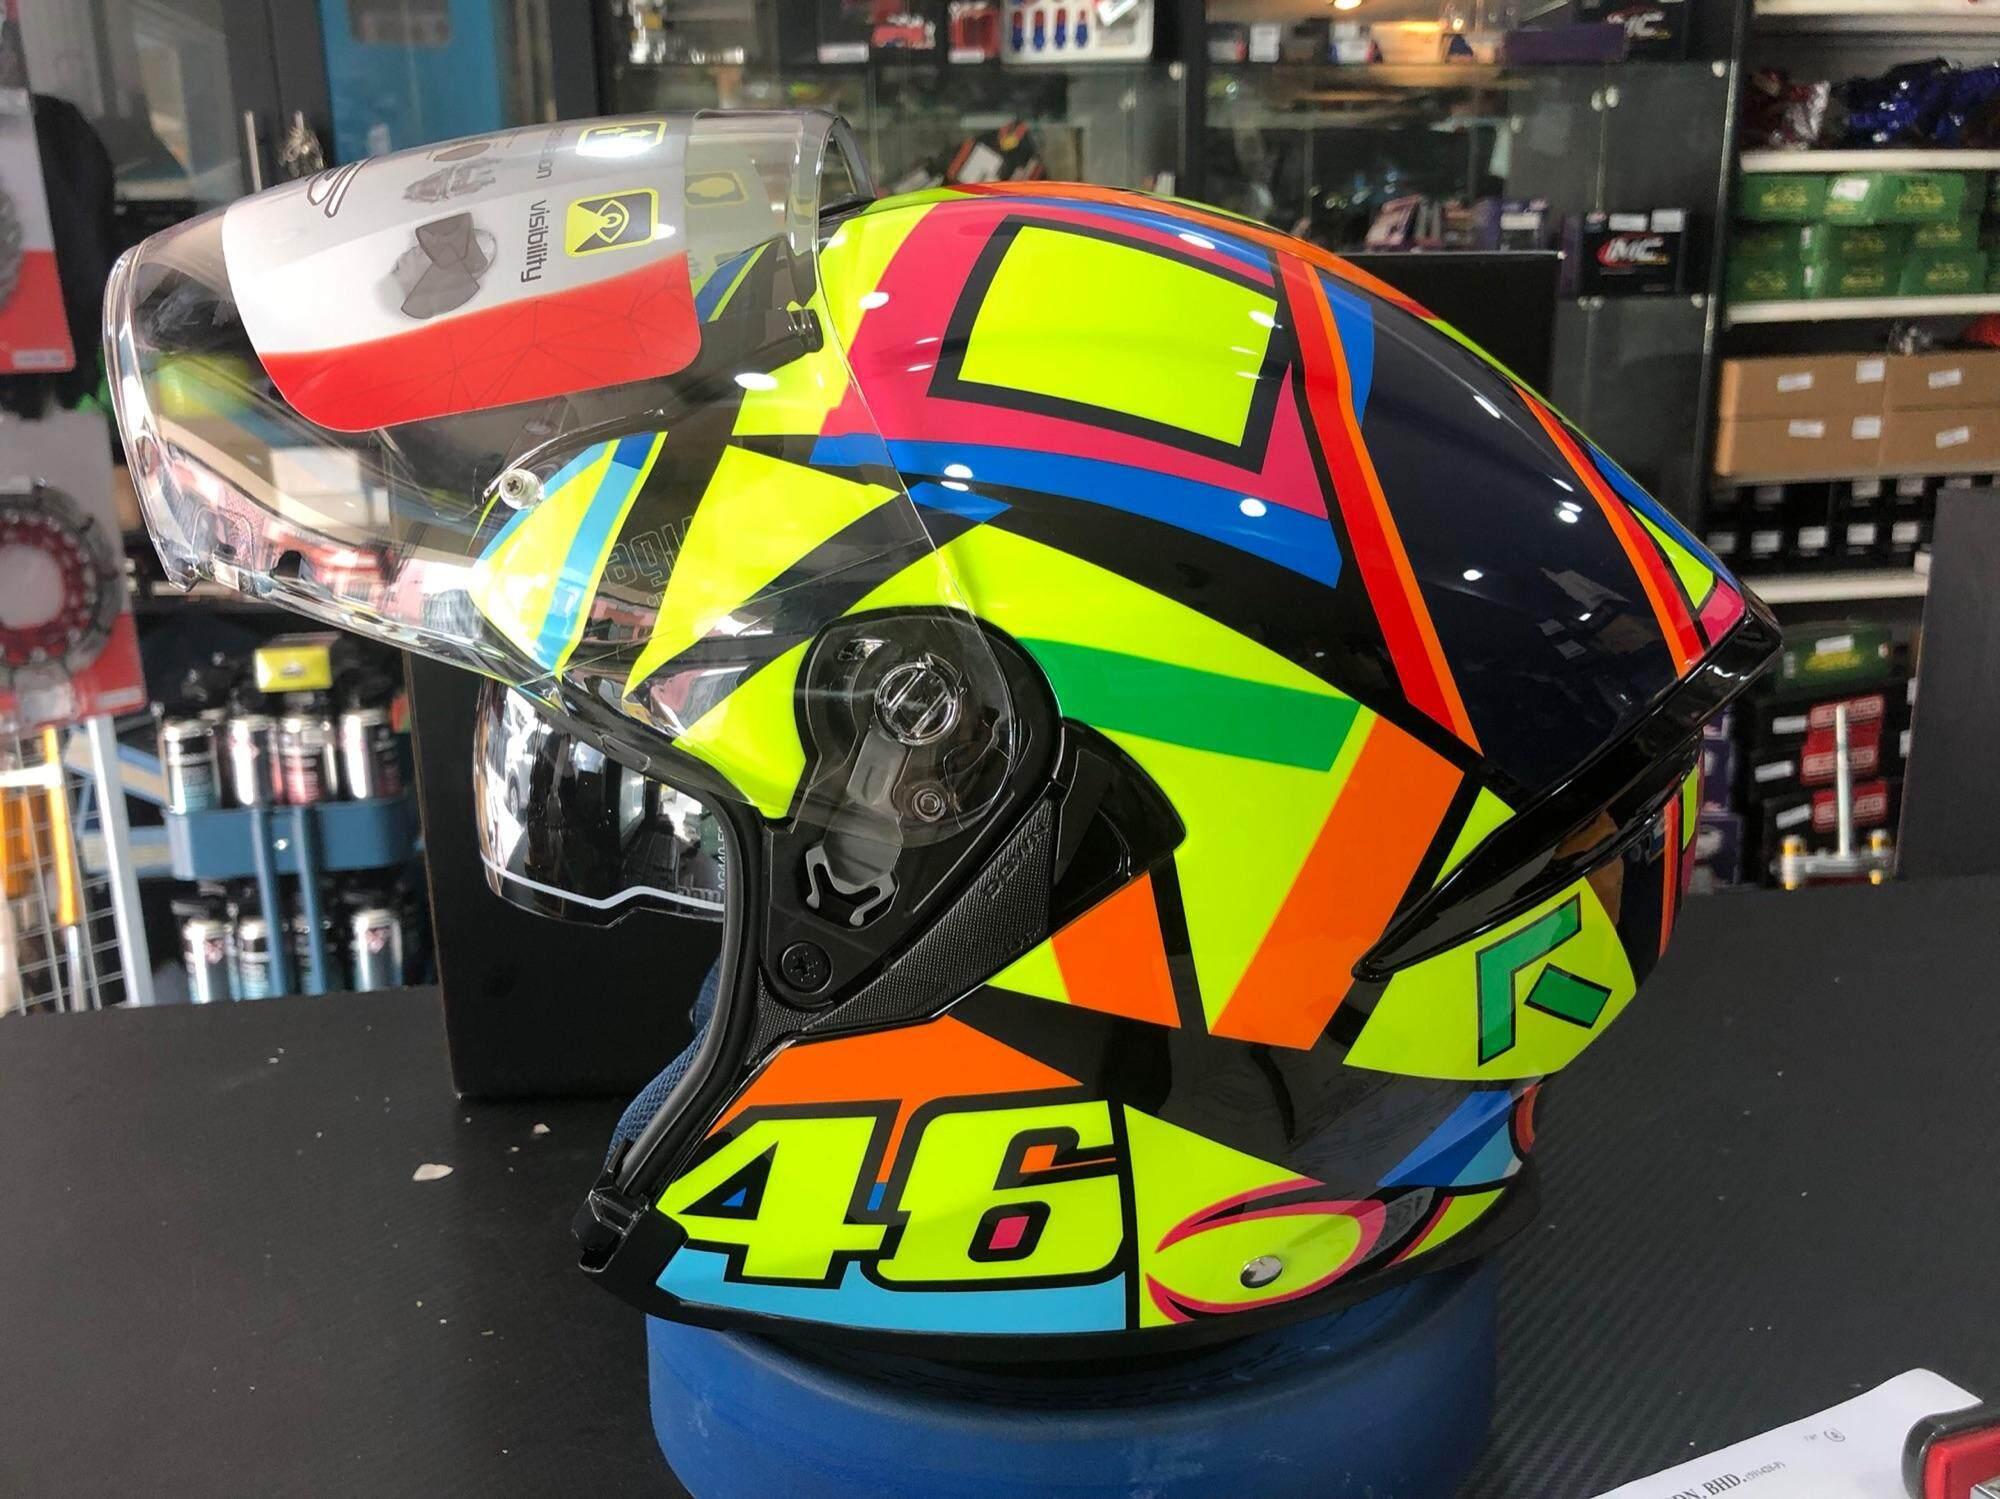 Agv K5 Jet Soleluna 2017 Buy Sell Online Helmet With Cheap Price Lazada